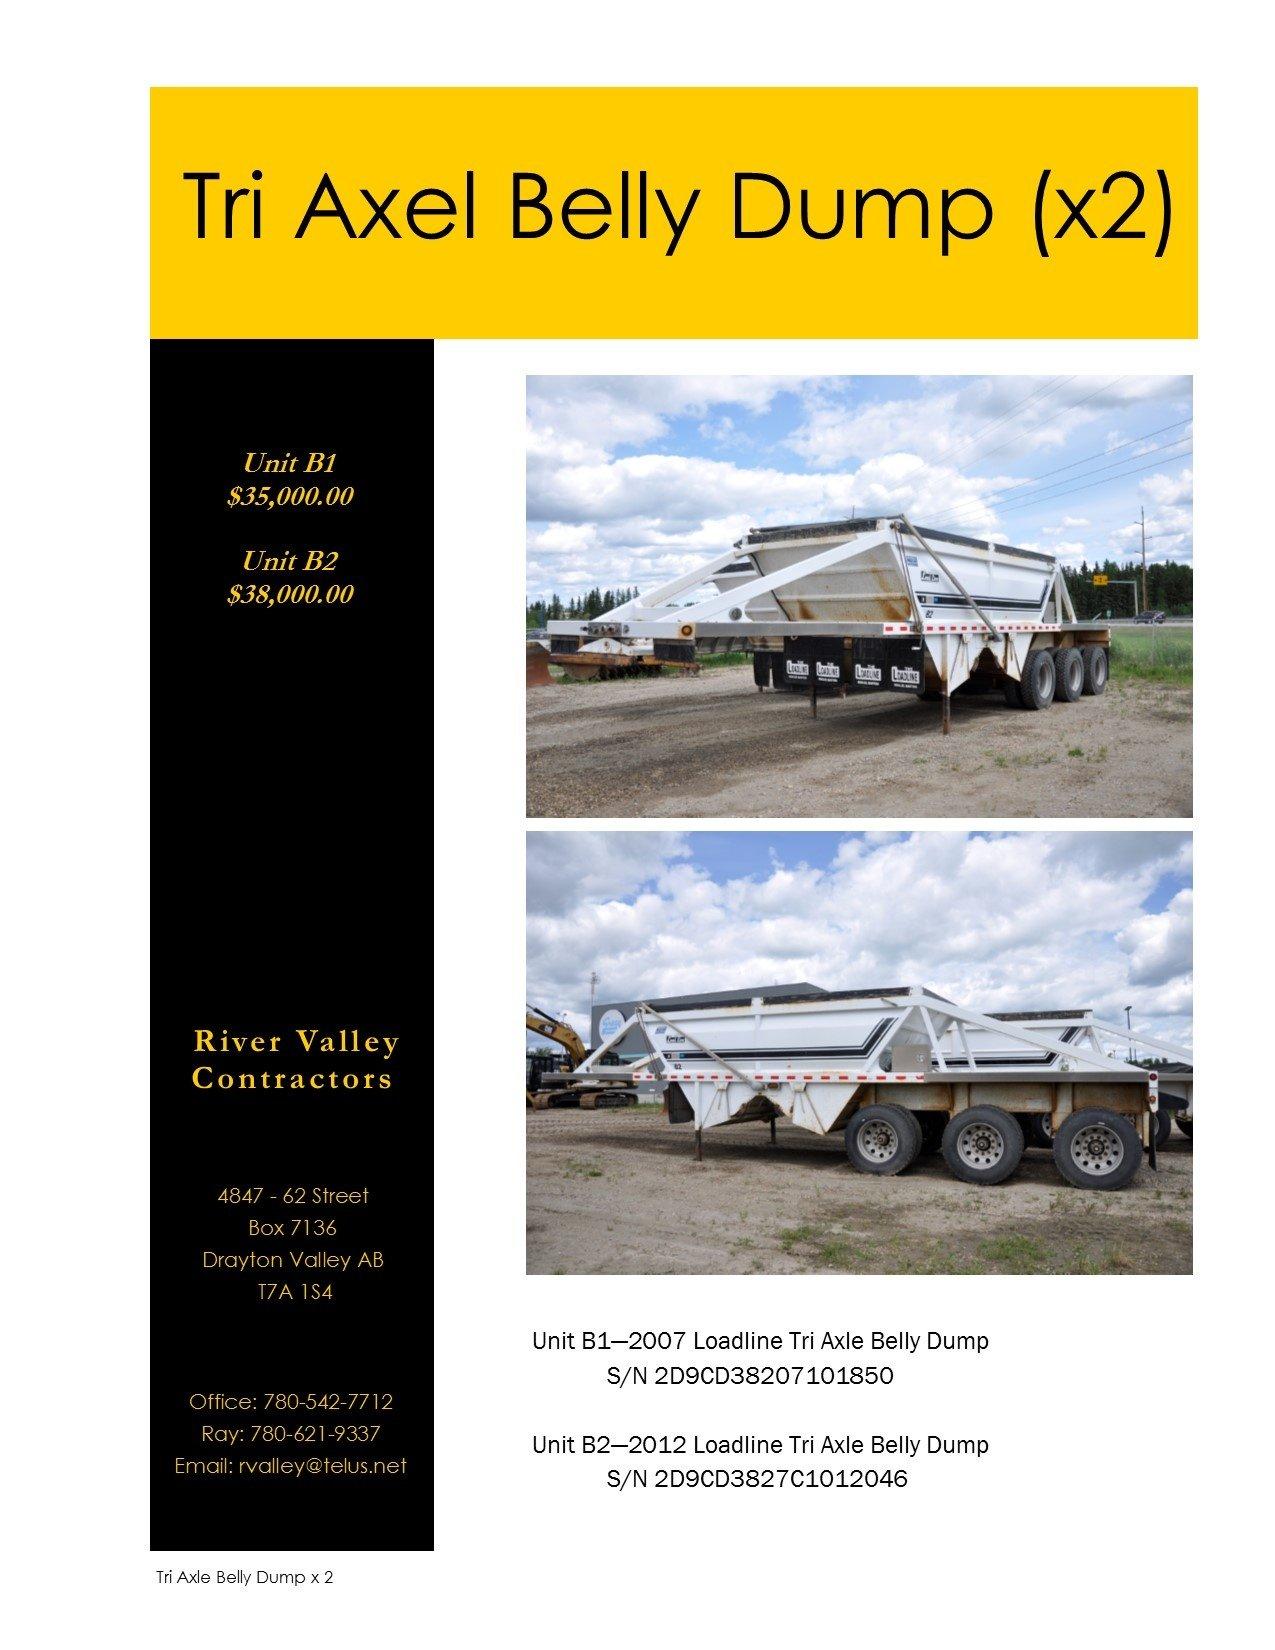 https://0901.nccdn.net/4_2/000/000/051/0ce/Tri-Axle-Belly-Dump-x-3-1275x1650.jpg